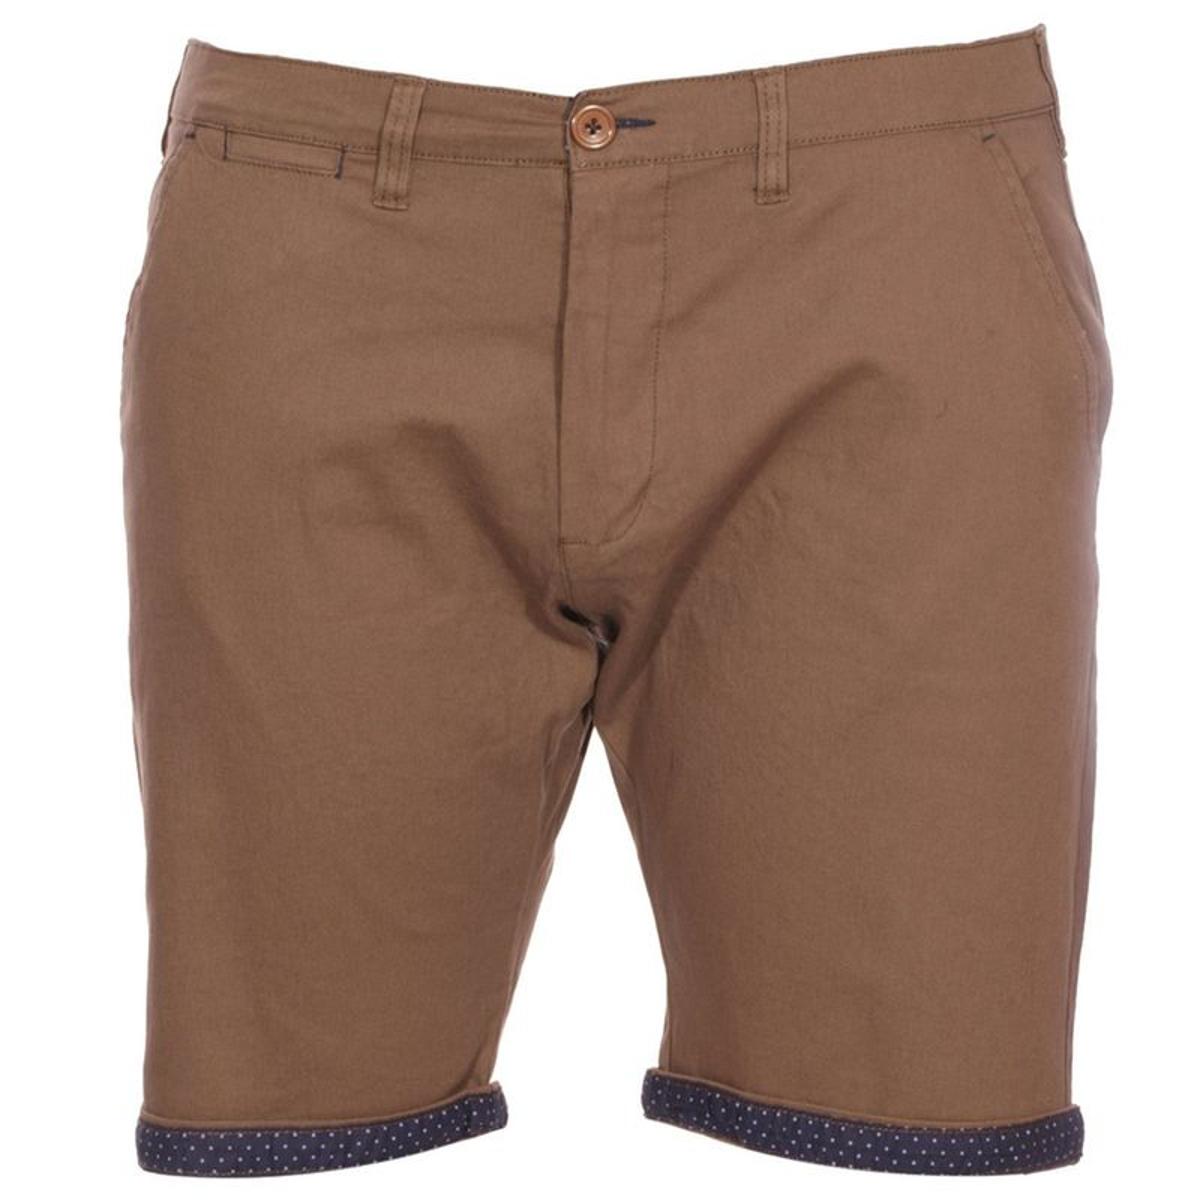 Short Coton, Elasthane